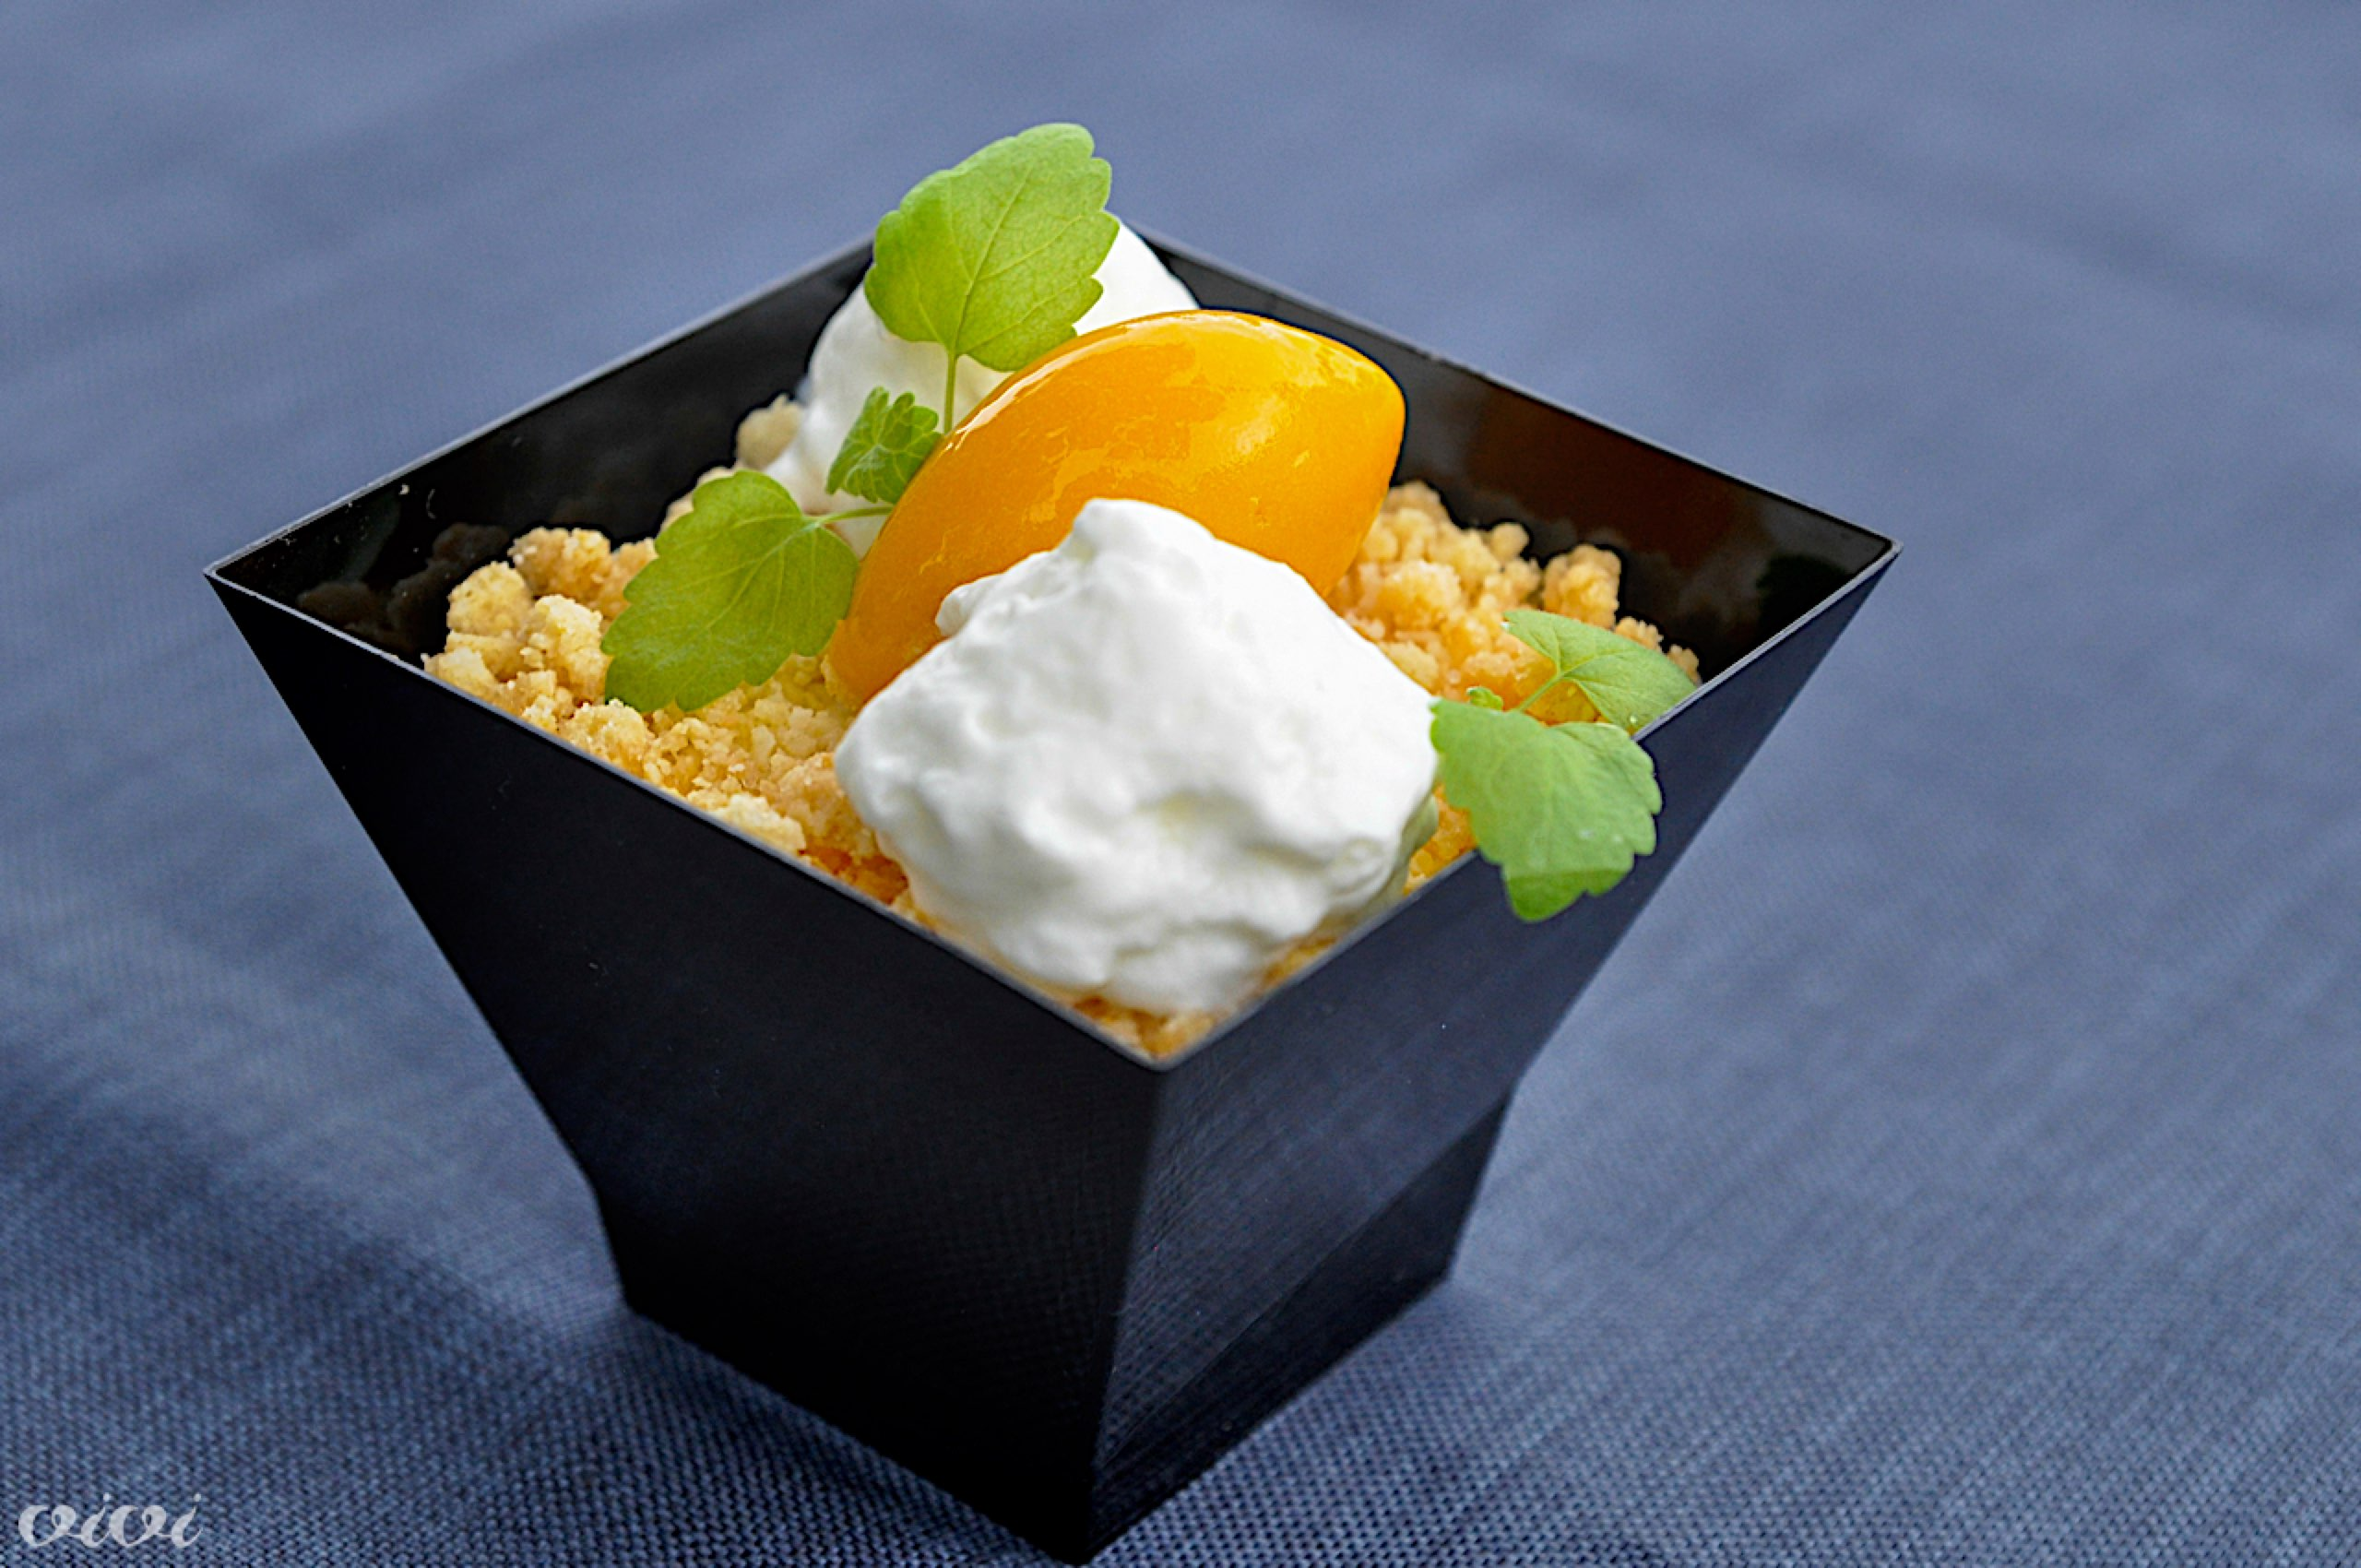 sladolent8 kovac mangov sorbet jogurtov mousse3